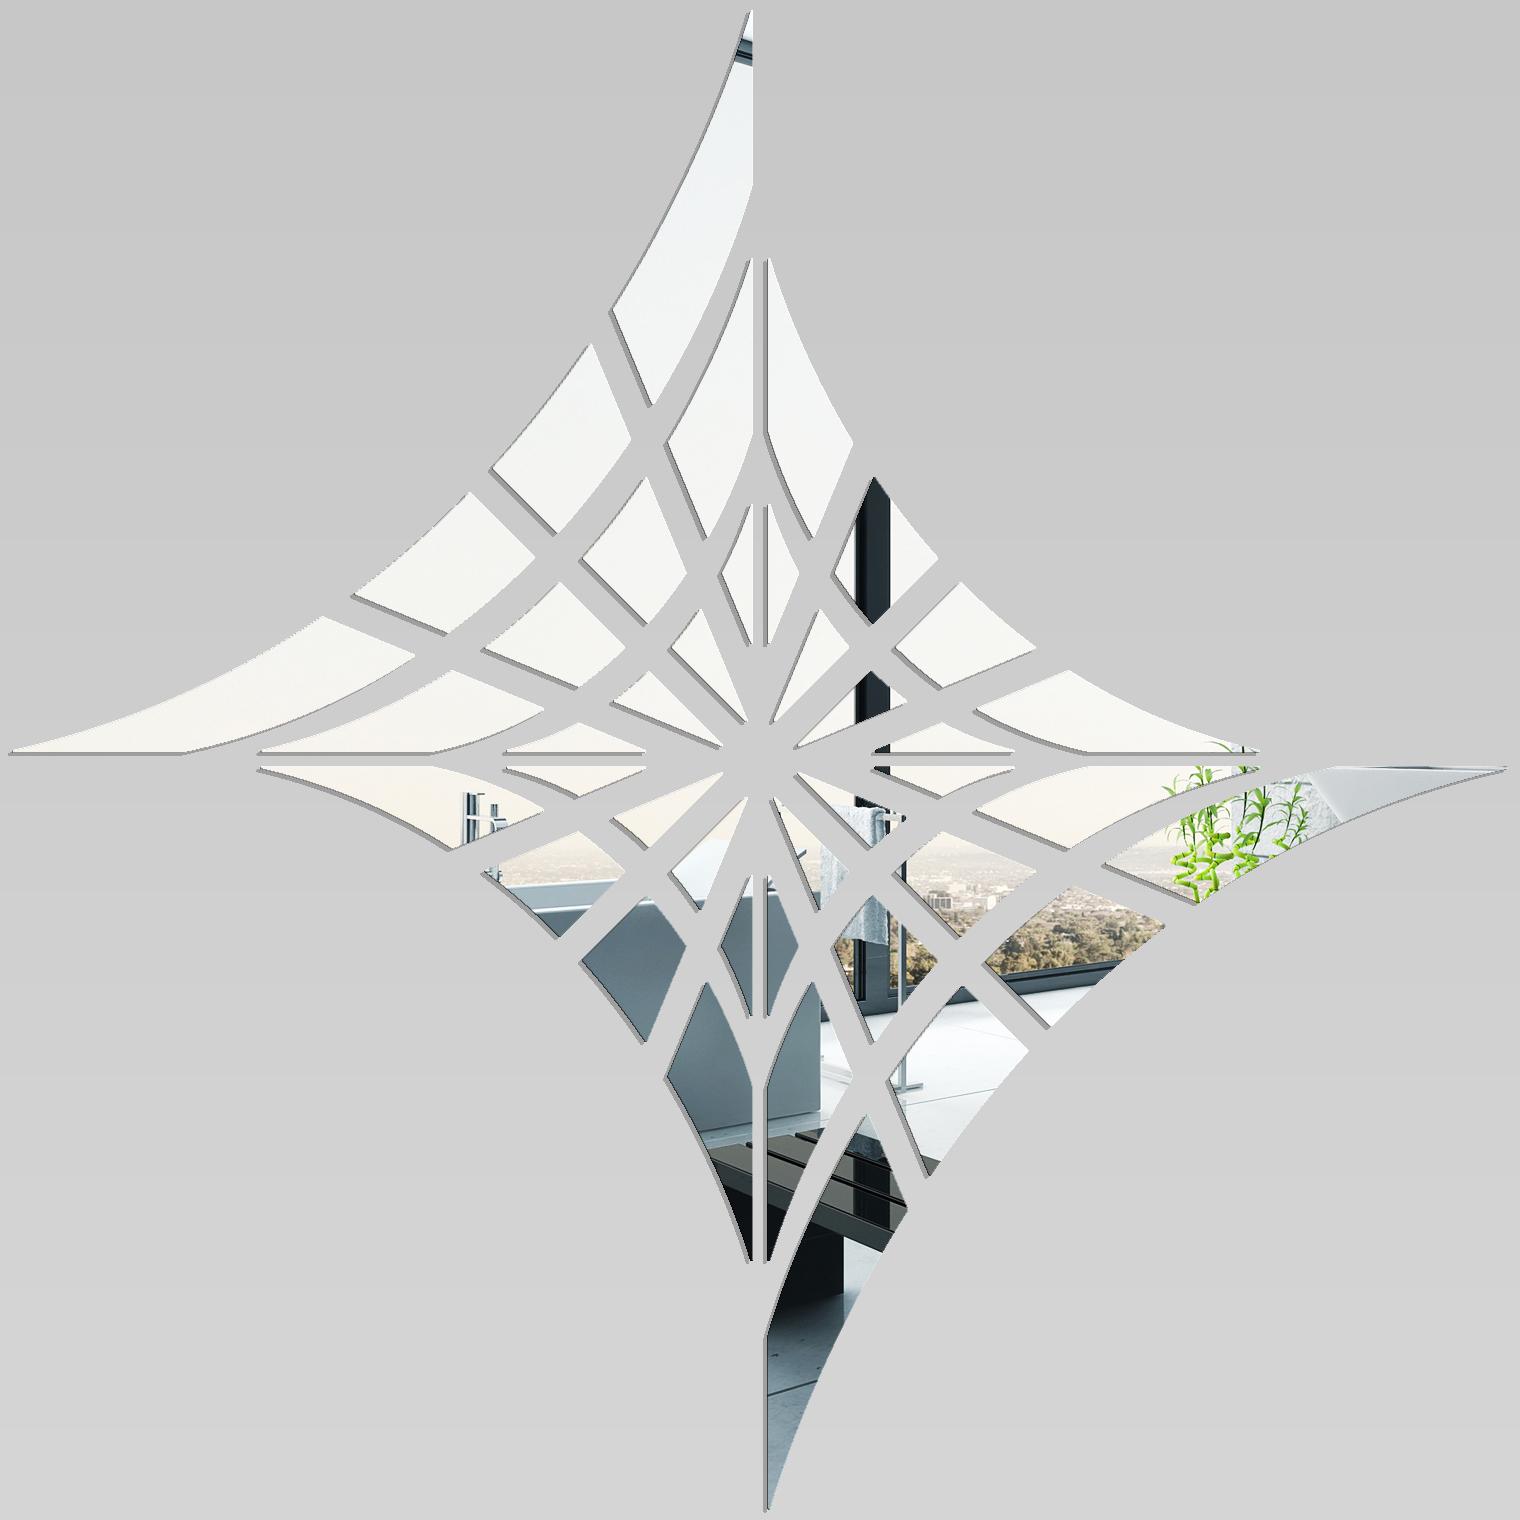 Adesivi Follia Specchio Acrilico Plexiglass Ragnatela